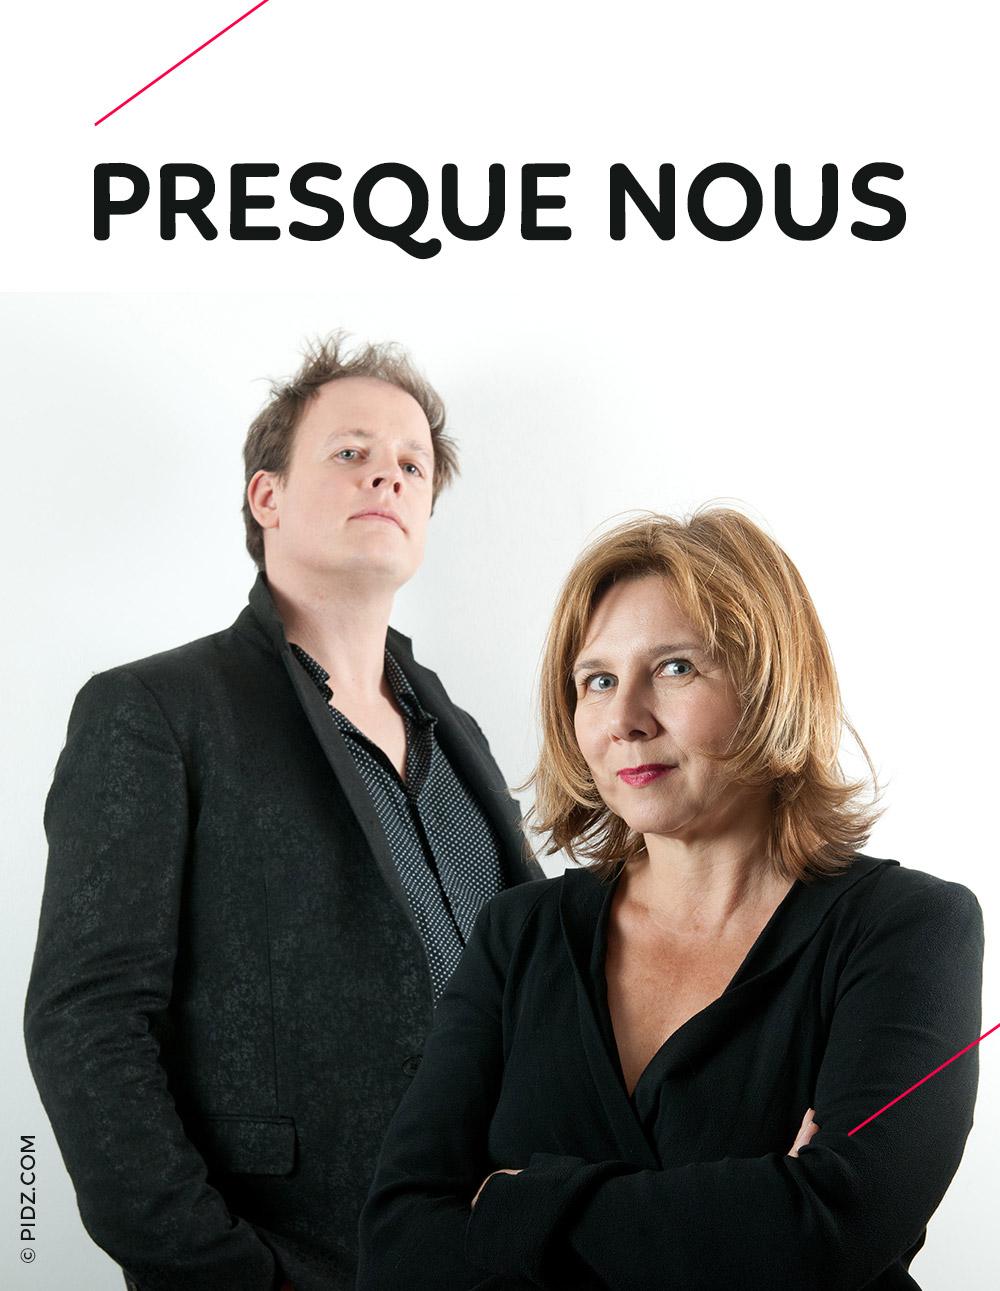 Presque nous - spectacle en duo avec Sophie Forte - Thibaud Defever - photo : Pidz.com